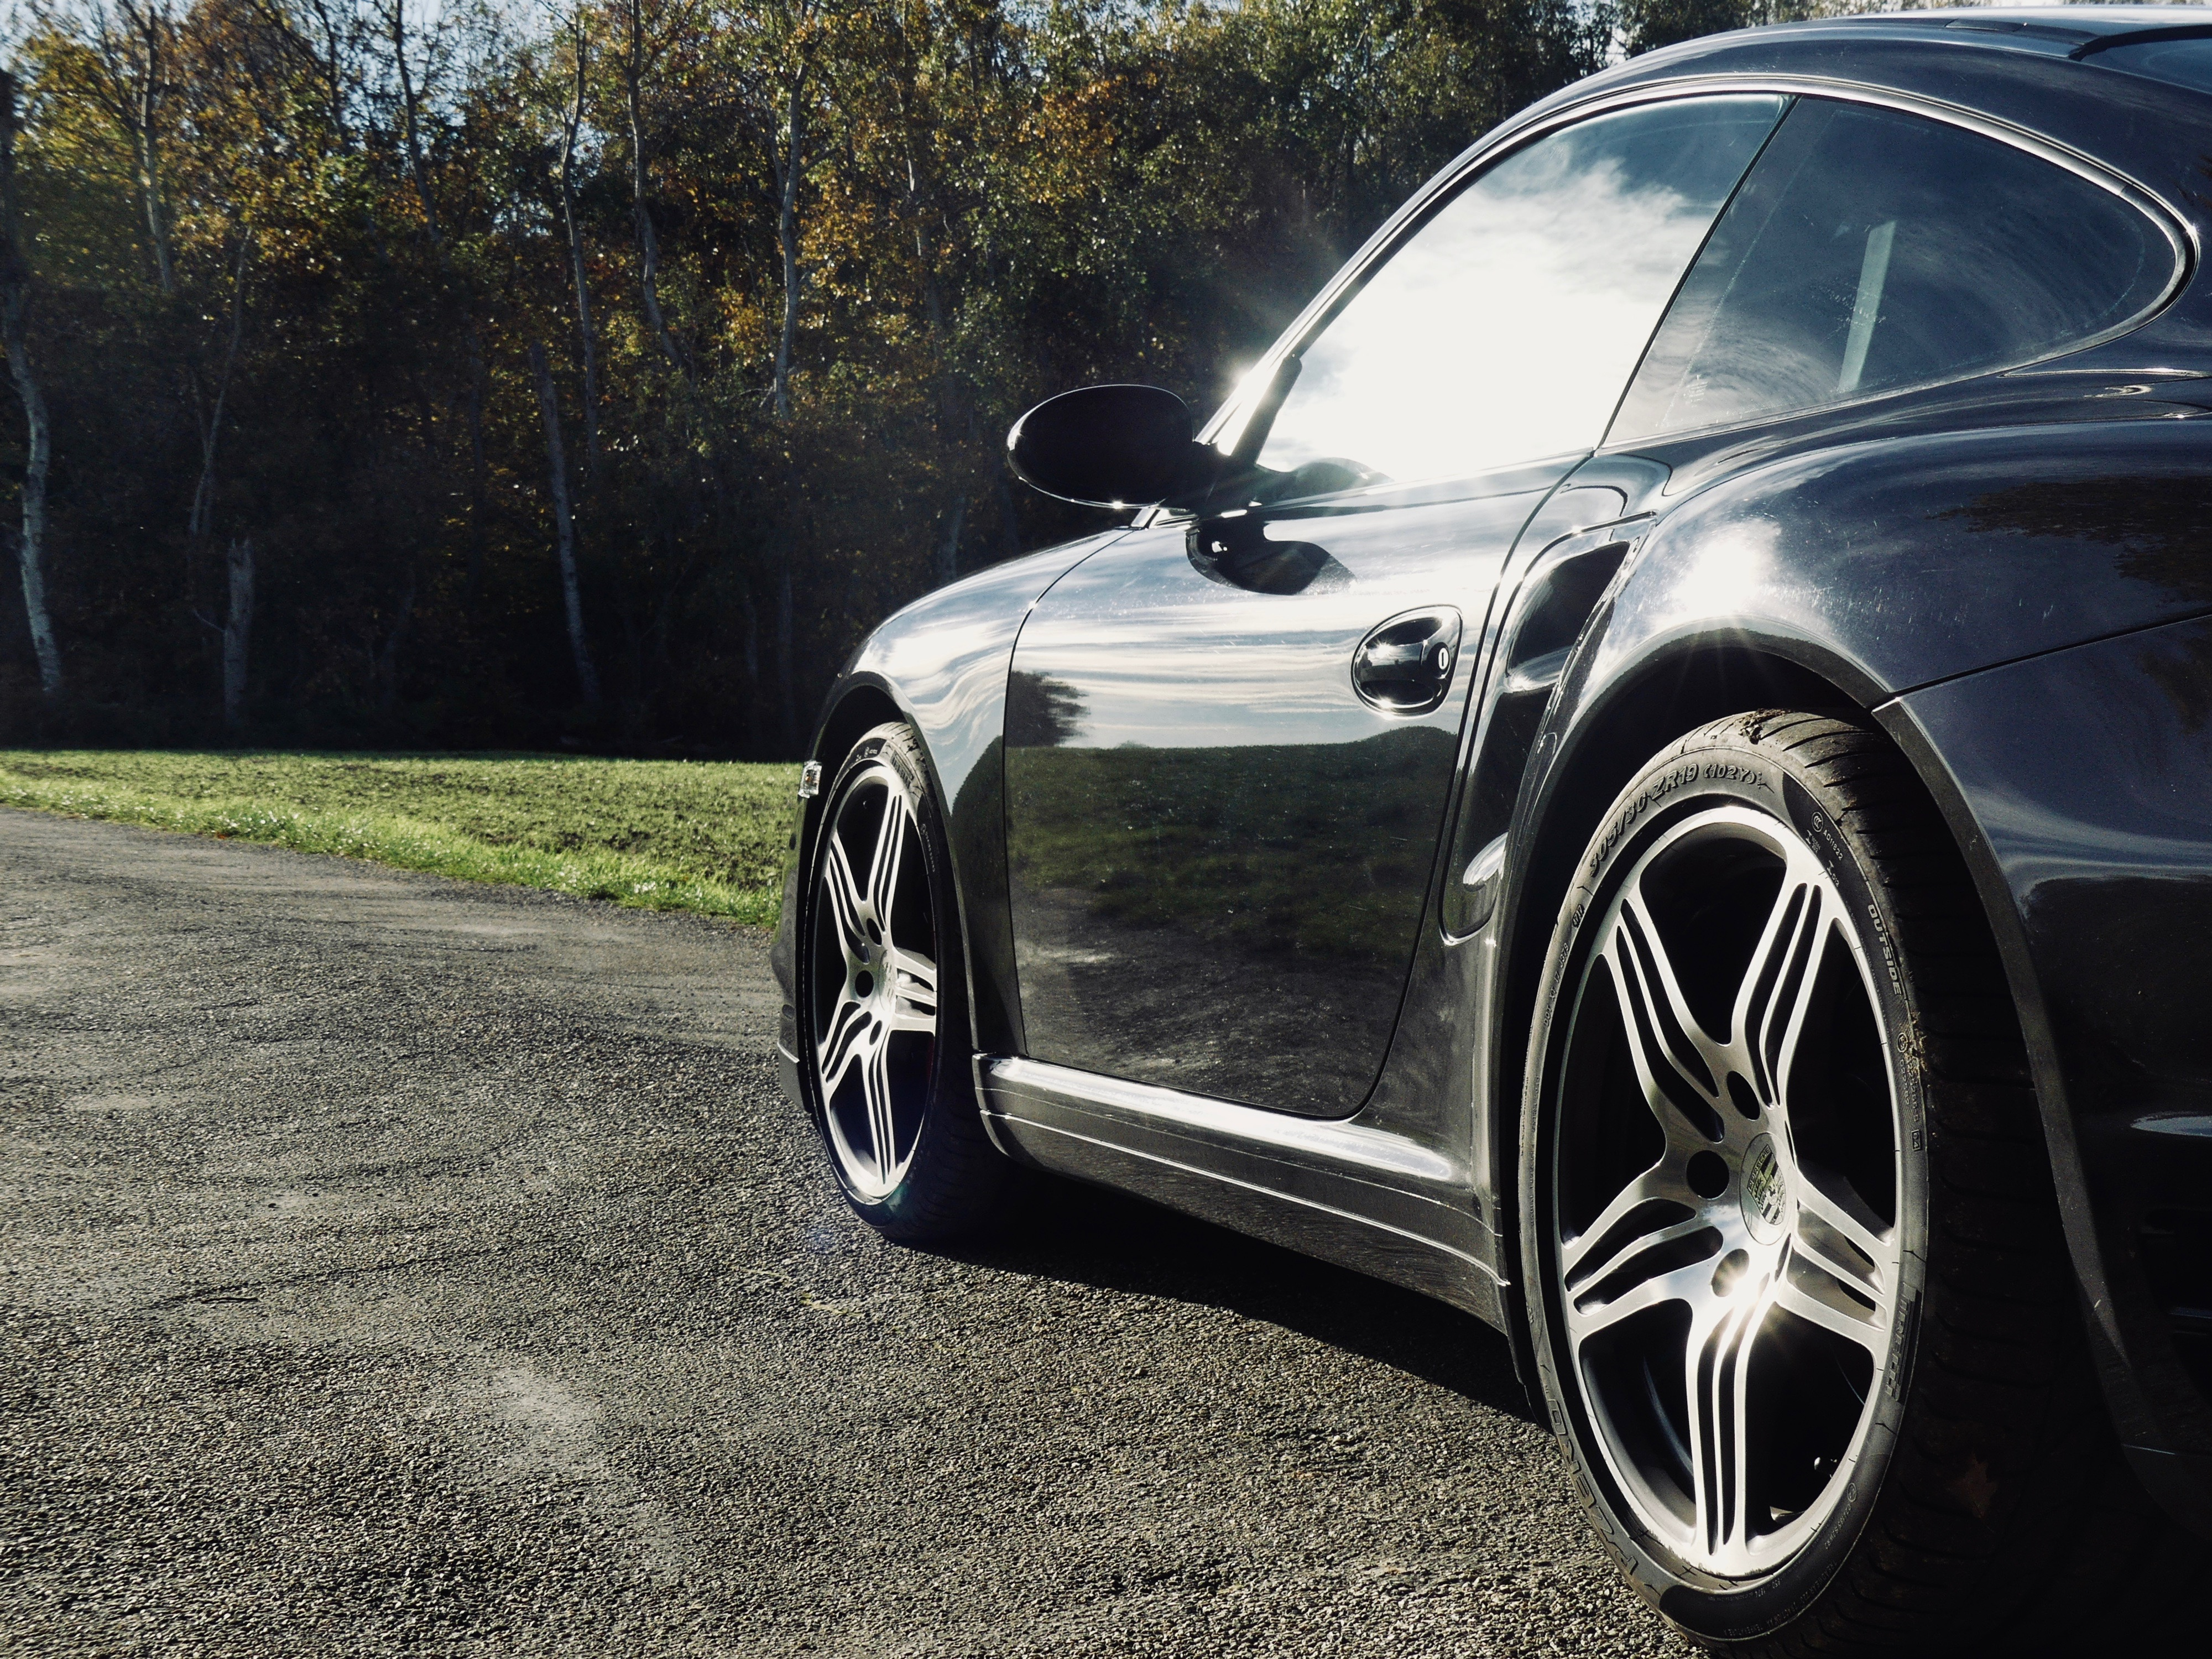 PORSCHE 911 997 Turbo 5